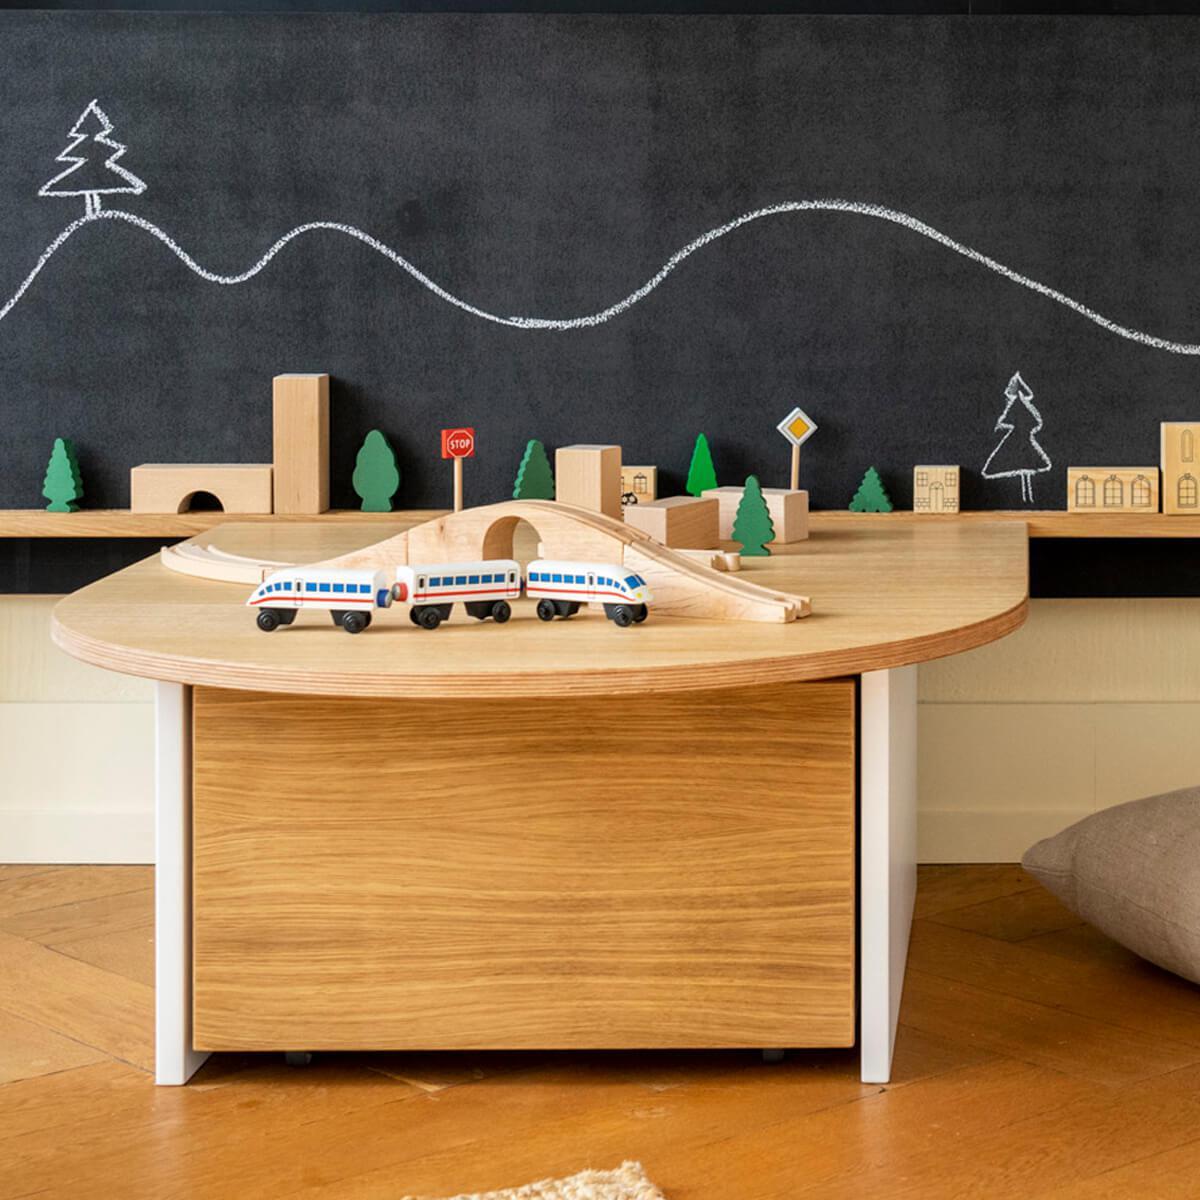 Table de jeu KASVA Debreuyn Multiplex placage chêne laqué blanc